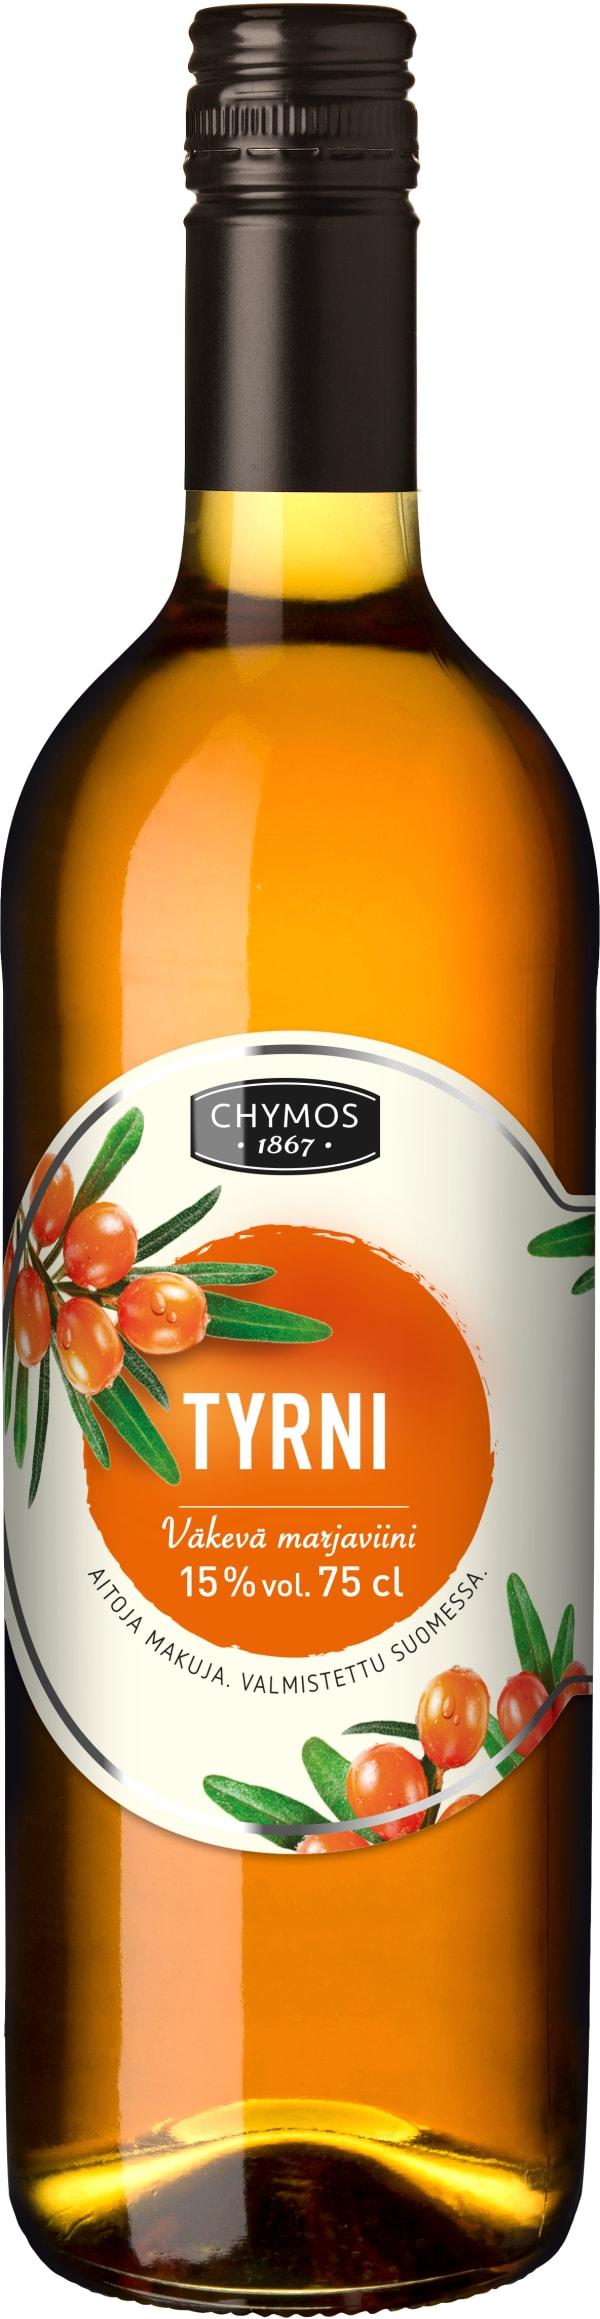 Chymos Tyrni Väkevä marjaviini